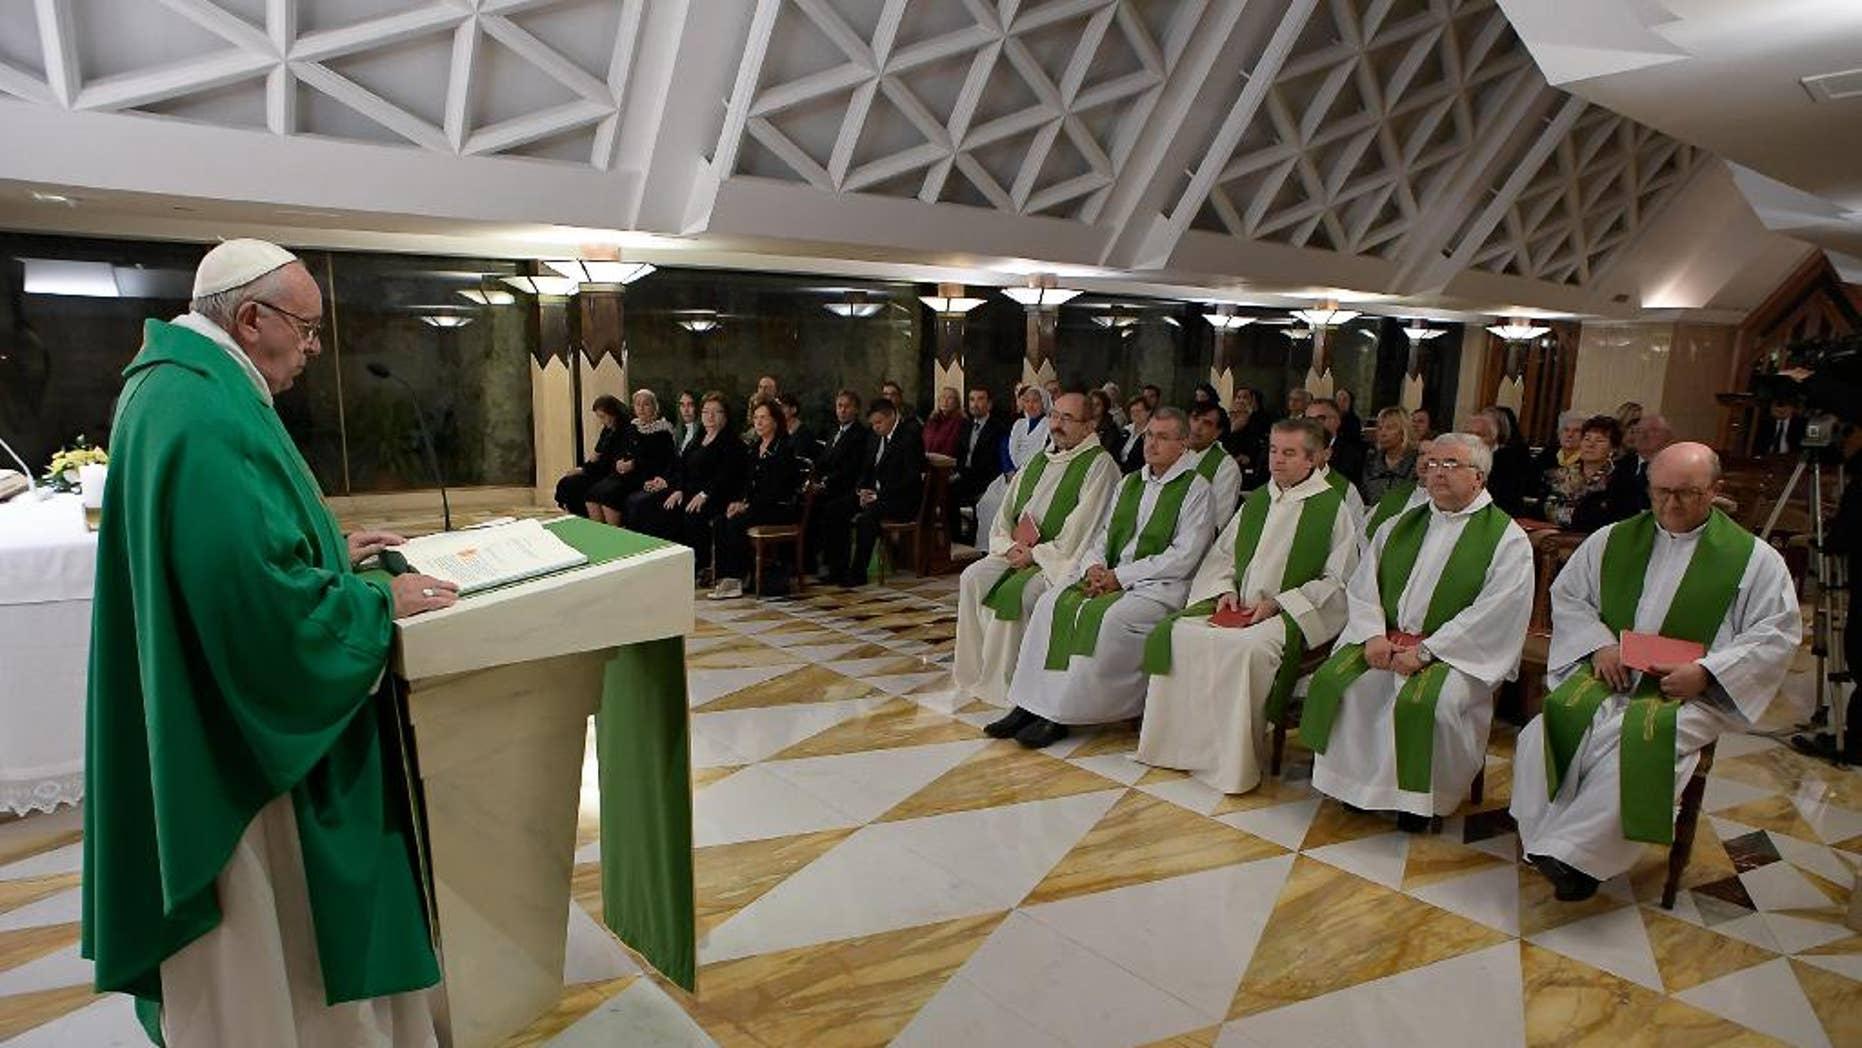 Pope Francis celebrates Mass in the chapel of Santa Marta, at the Vatican, Thursday, Oct. 20, 2016. (L'Osservatore Romano/Pool Photo via AP)